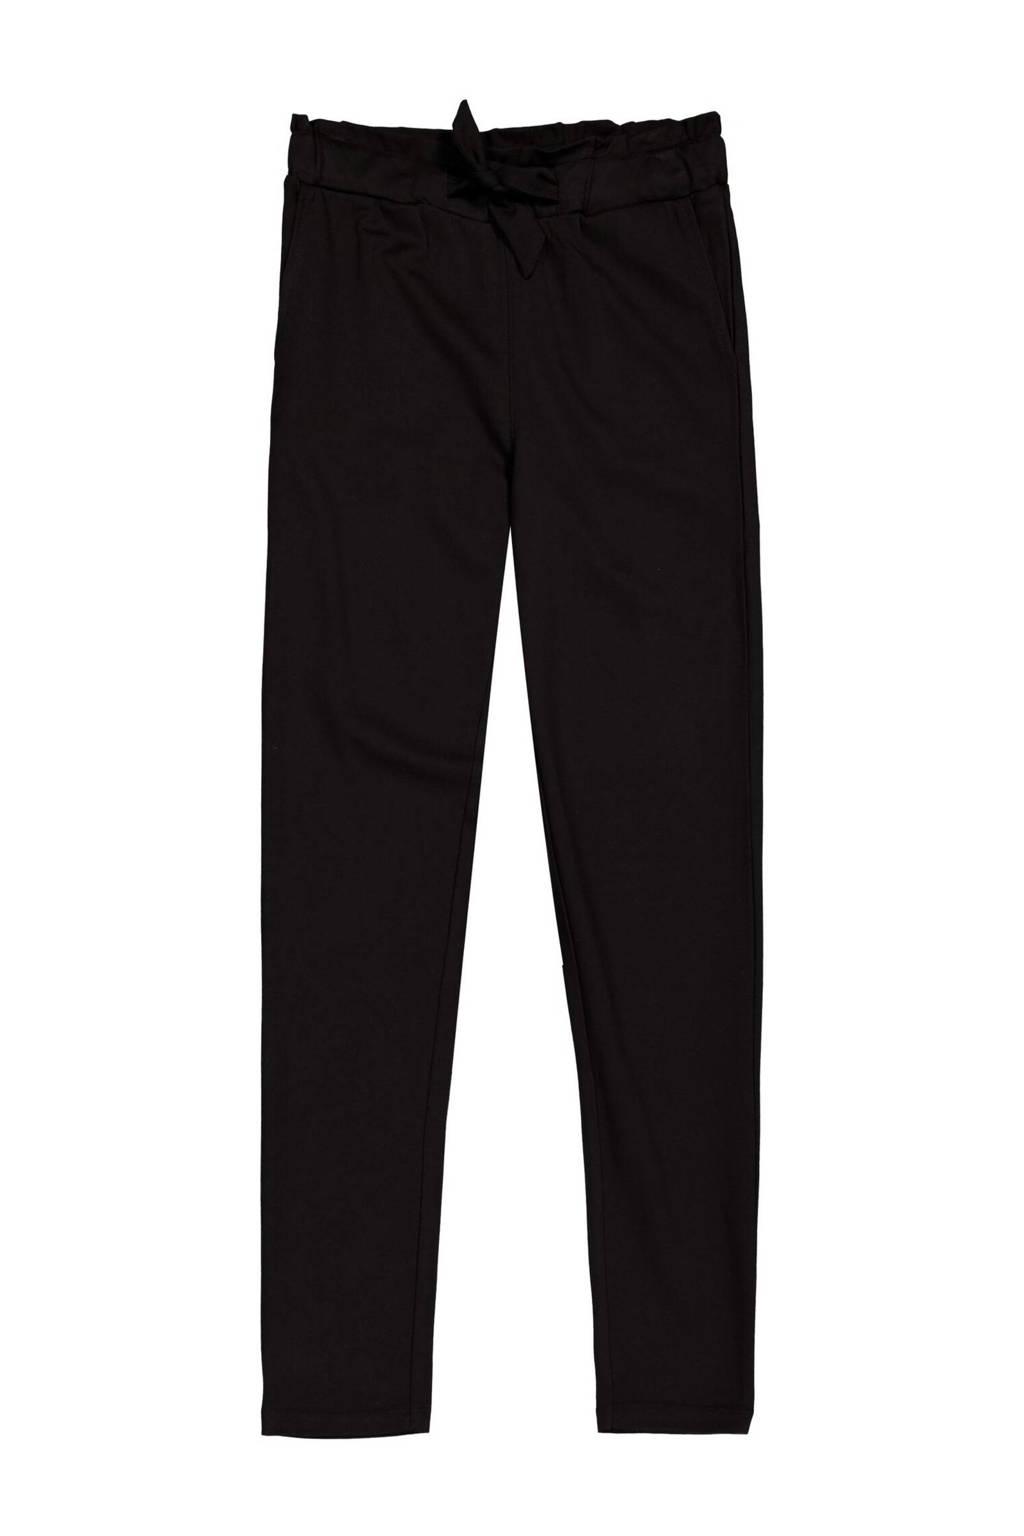 Garcia regular fit broek zwart, Zwart